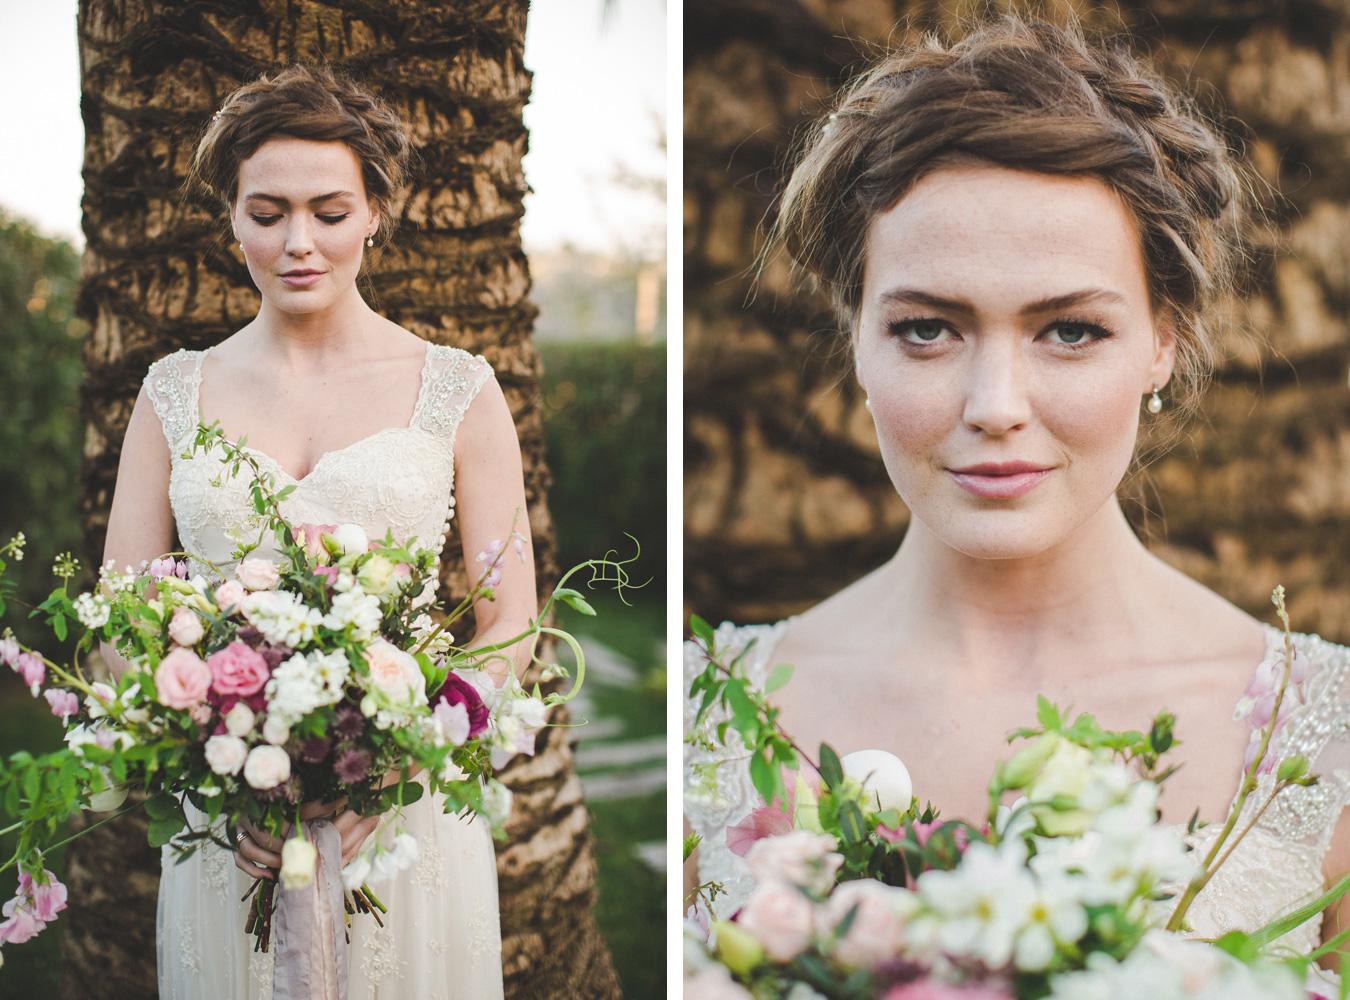 020-fotograf-tone-tvedt-bryllup-i-utlandet.jpg